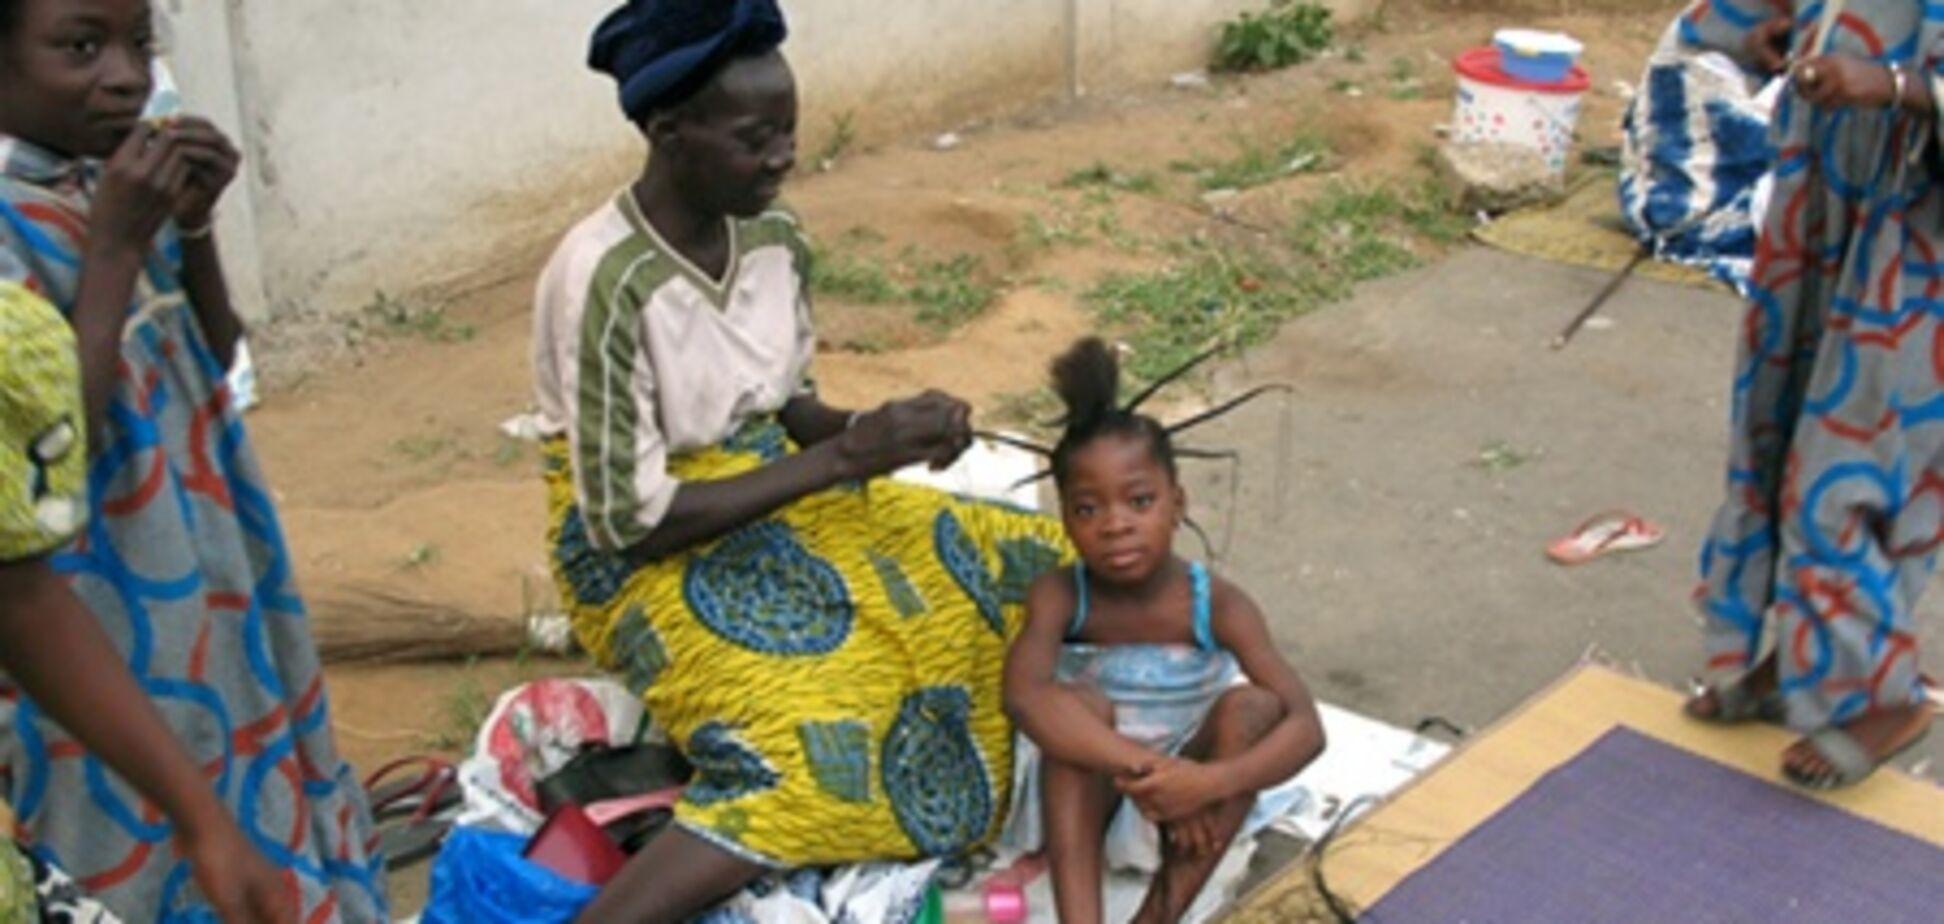 Кот-д'Івуар: ложка нафти в банку какао